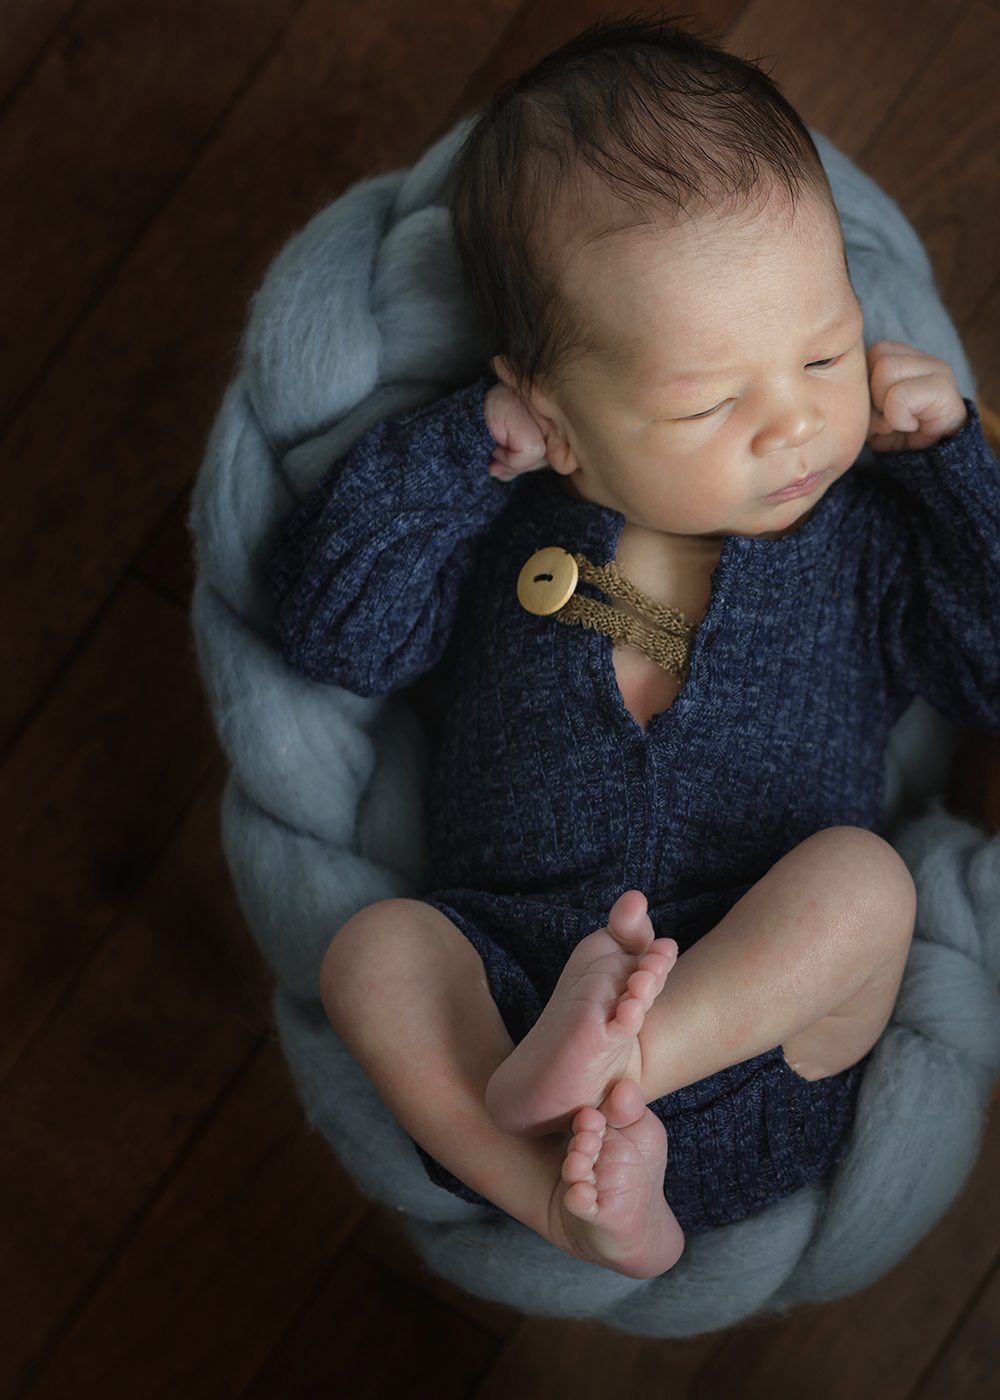 Edmonton Newborn Photographer_Baby Vinh 11.jpg